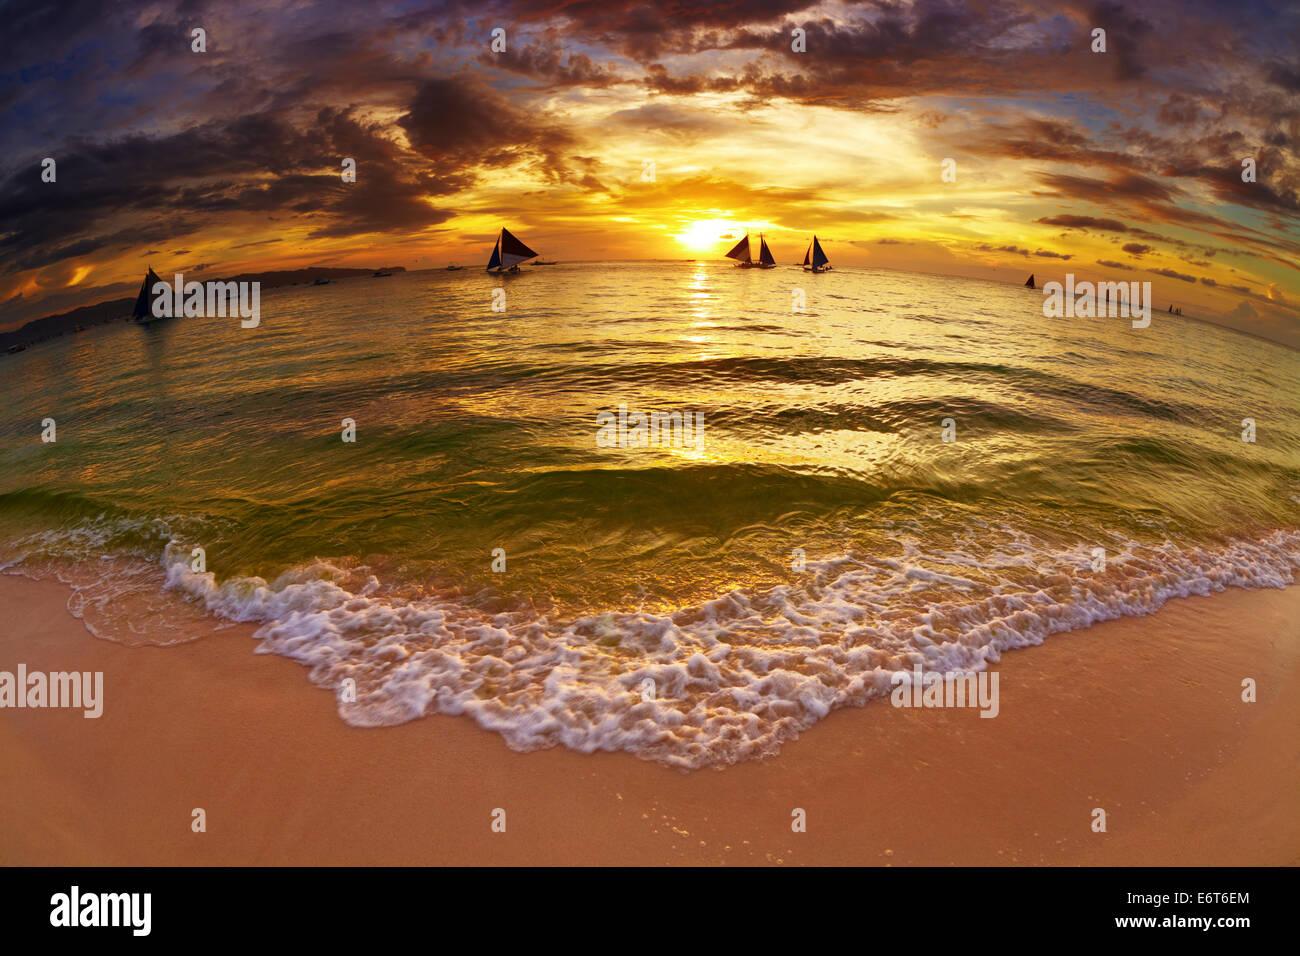 Tropical beach at sunset, Boracay island, Philippines, fisheye shot - Stock Image